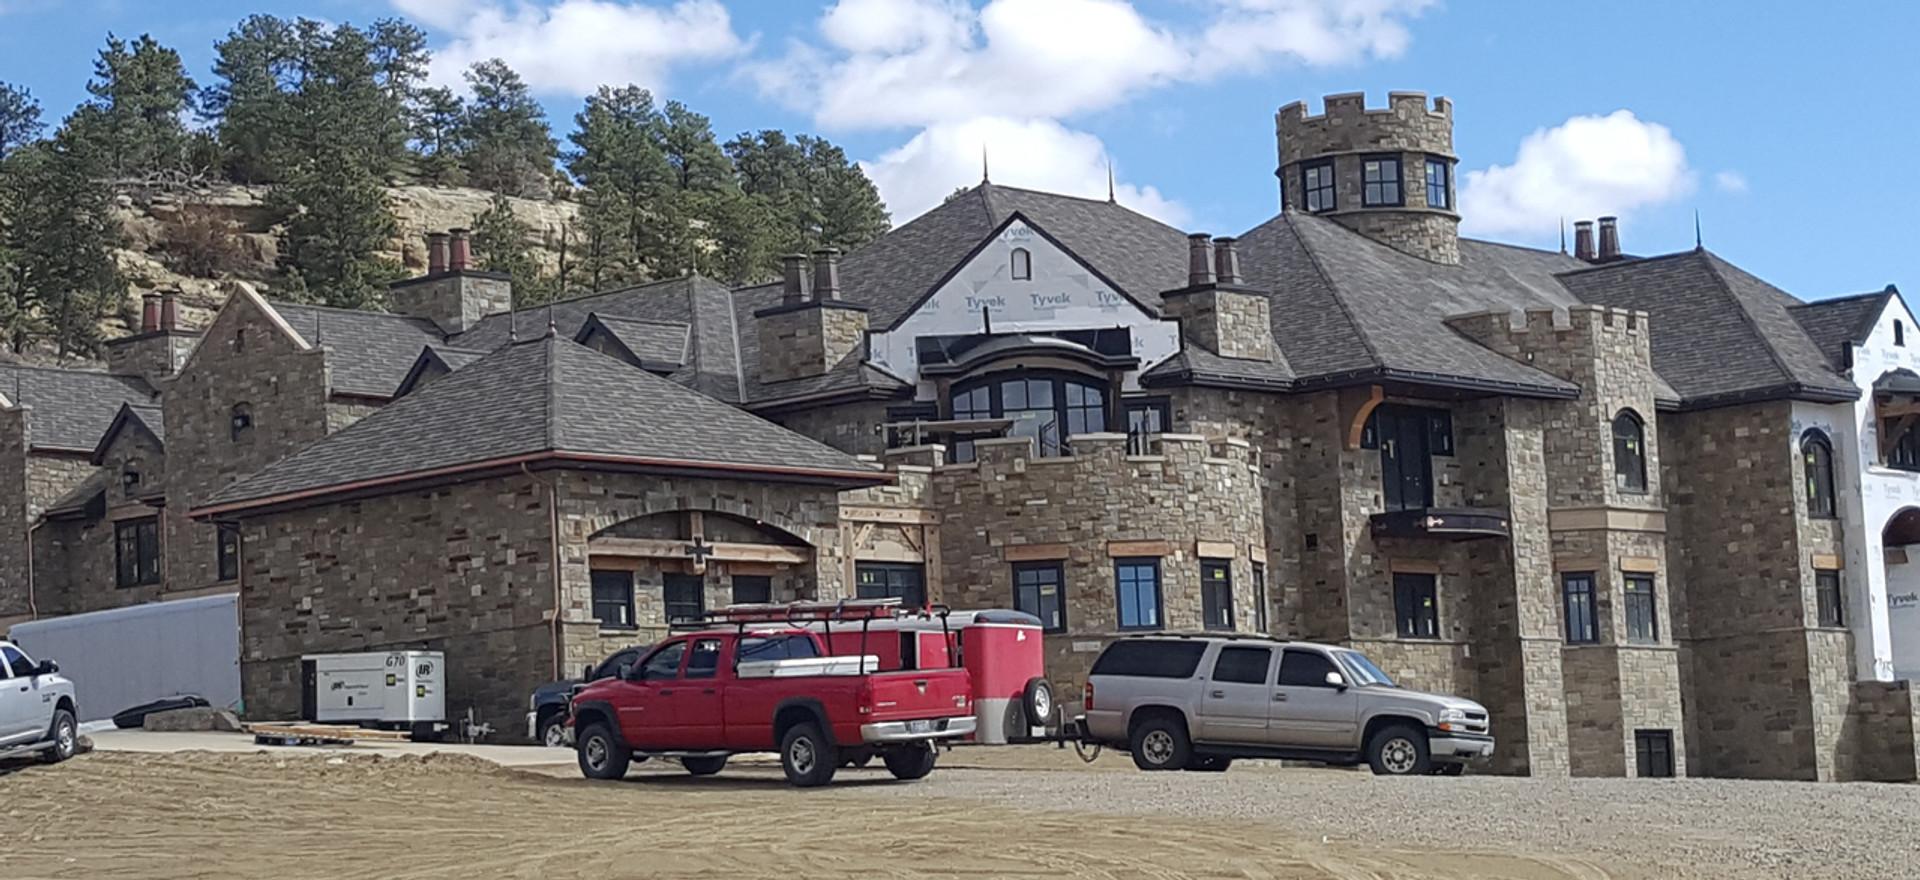 JR Castle.jpg